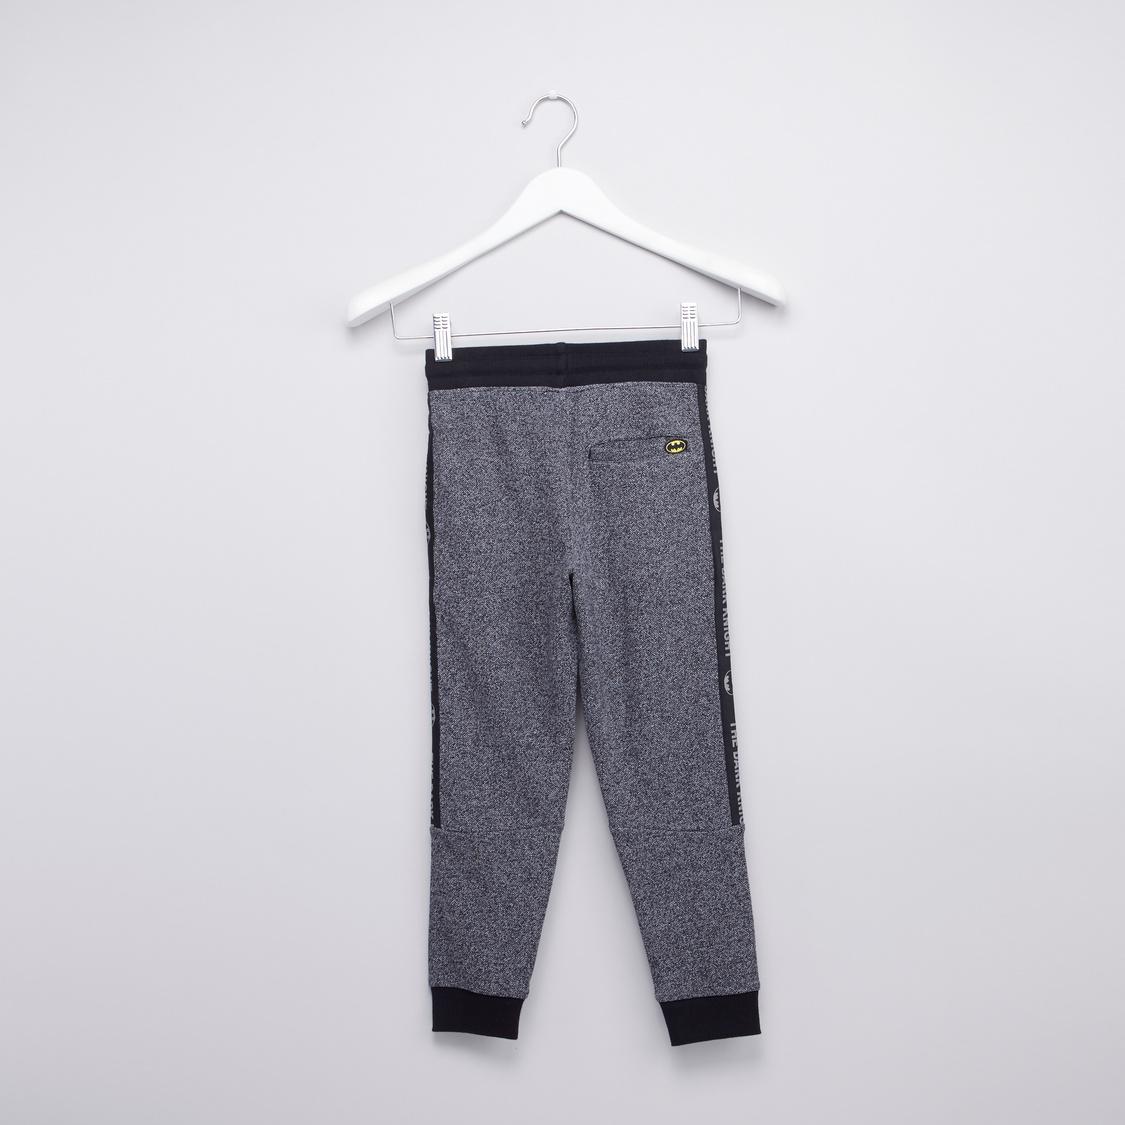 Batman Textured Jog Pants with Drawstring and Pocket Detail